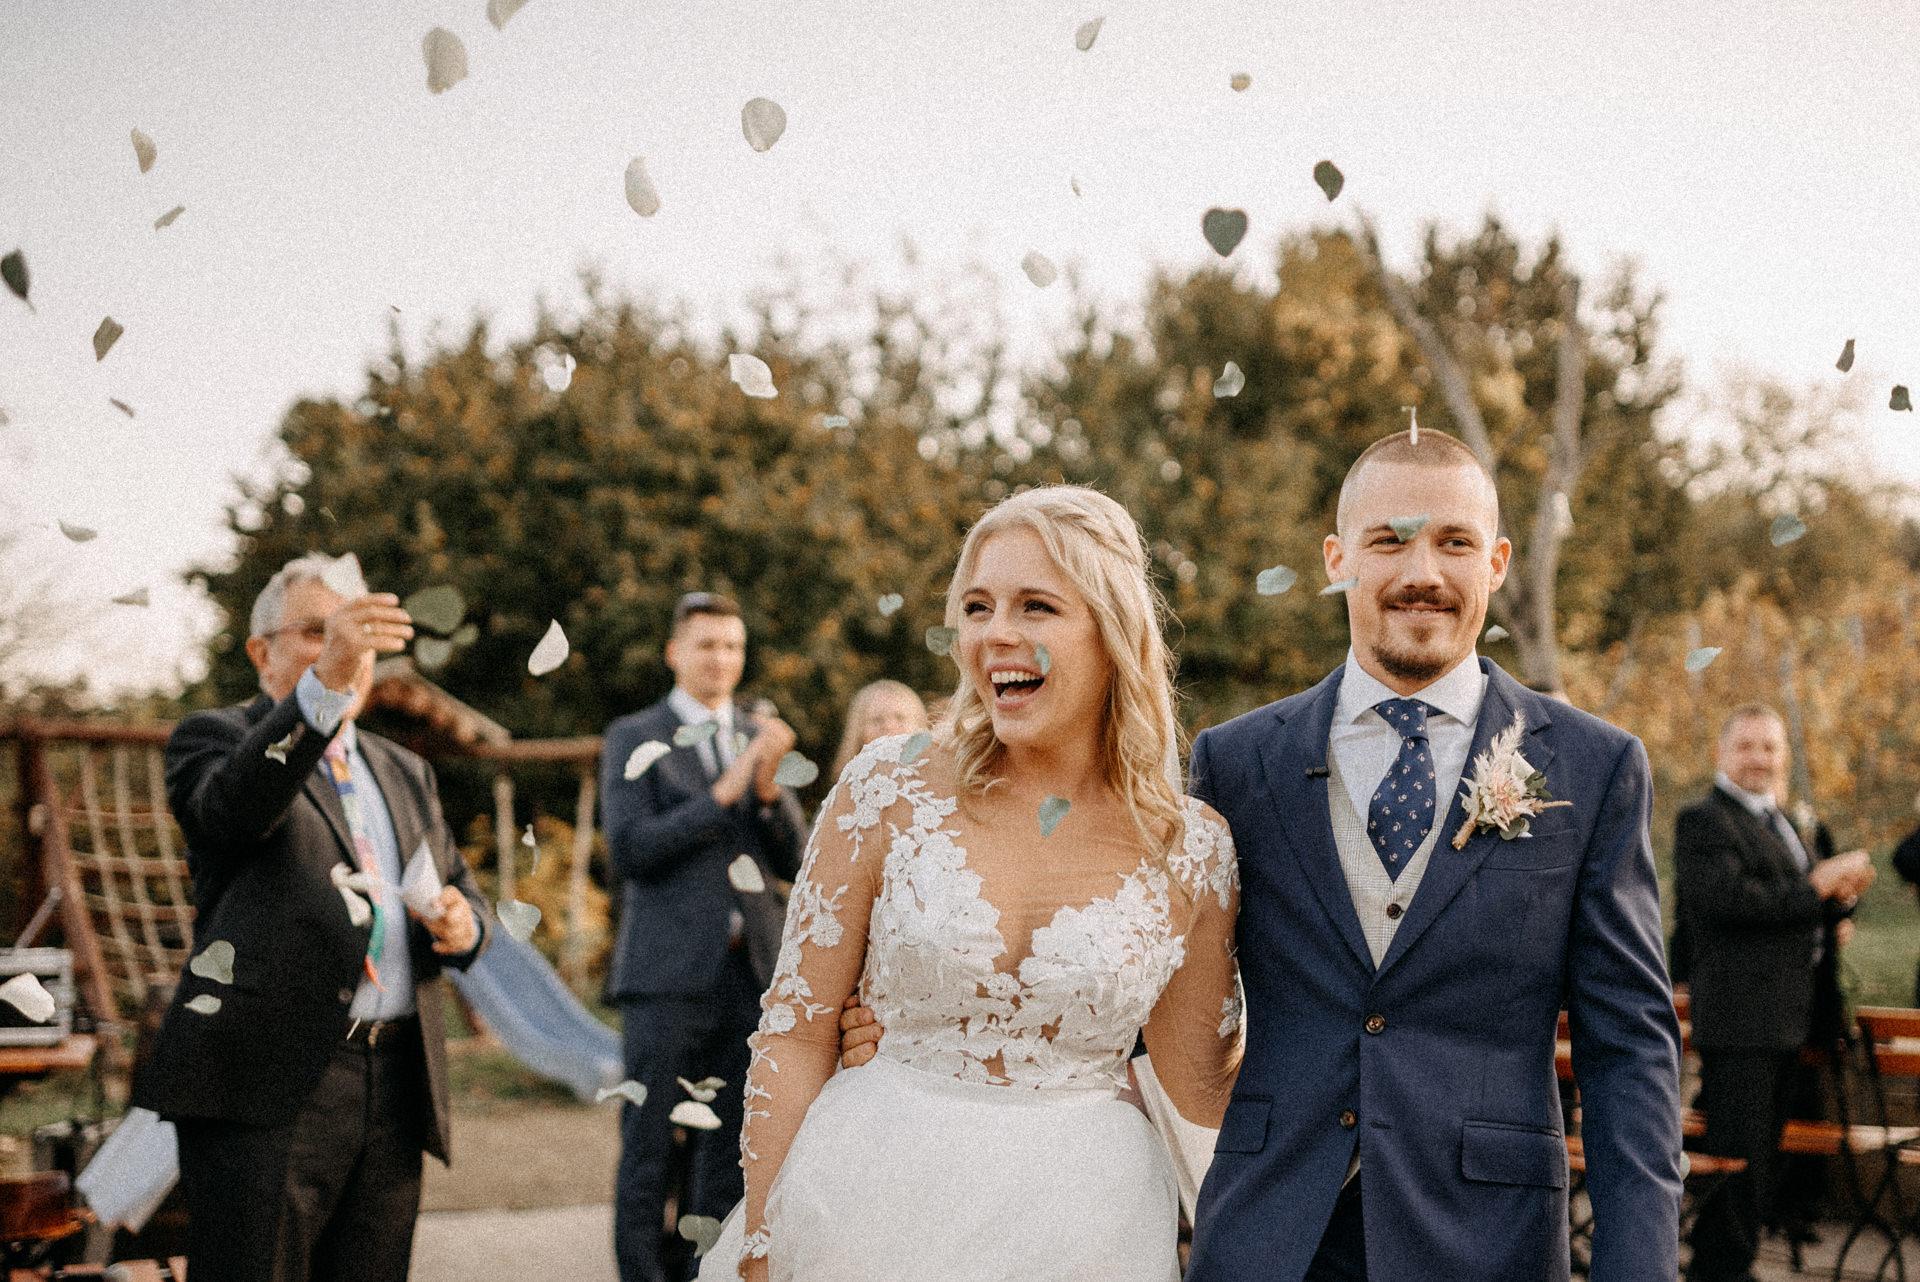 rokusfalvy birtok etyek eskuvo wedding sziromszoras